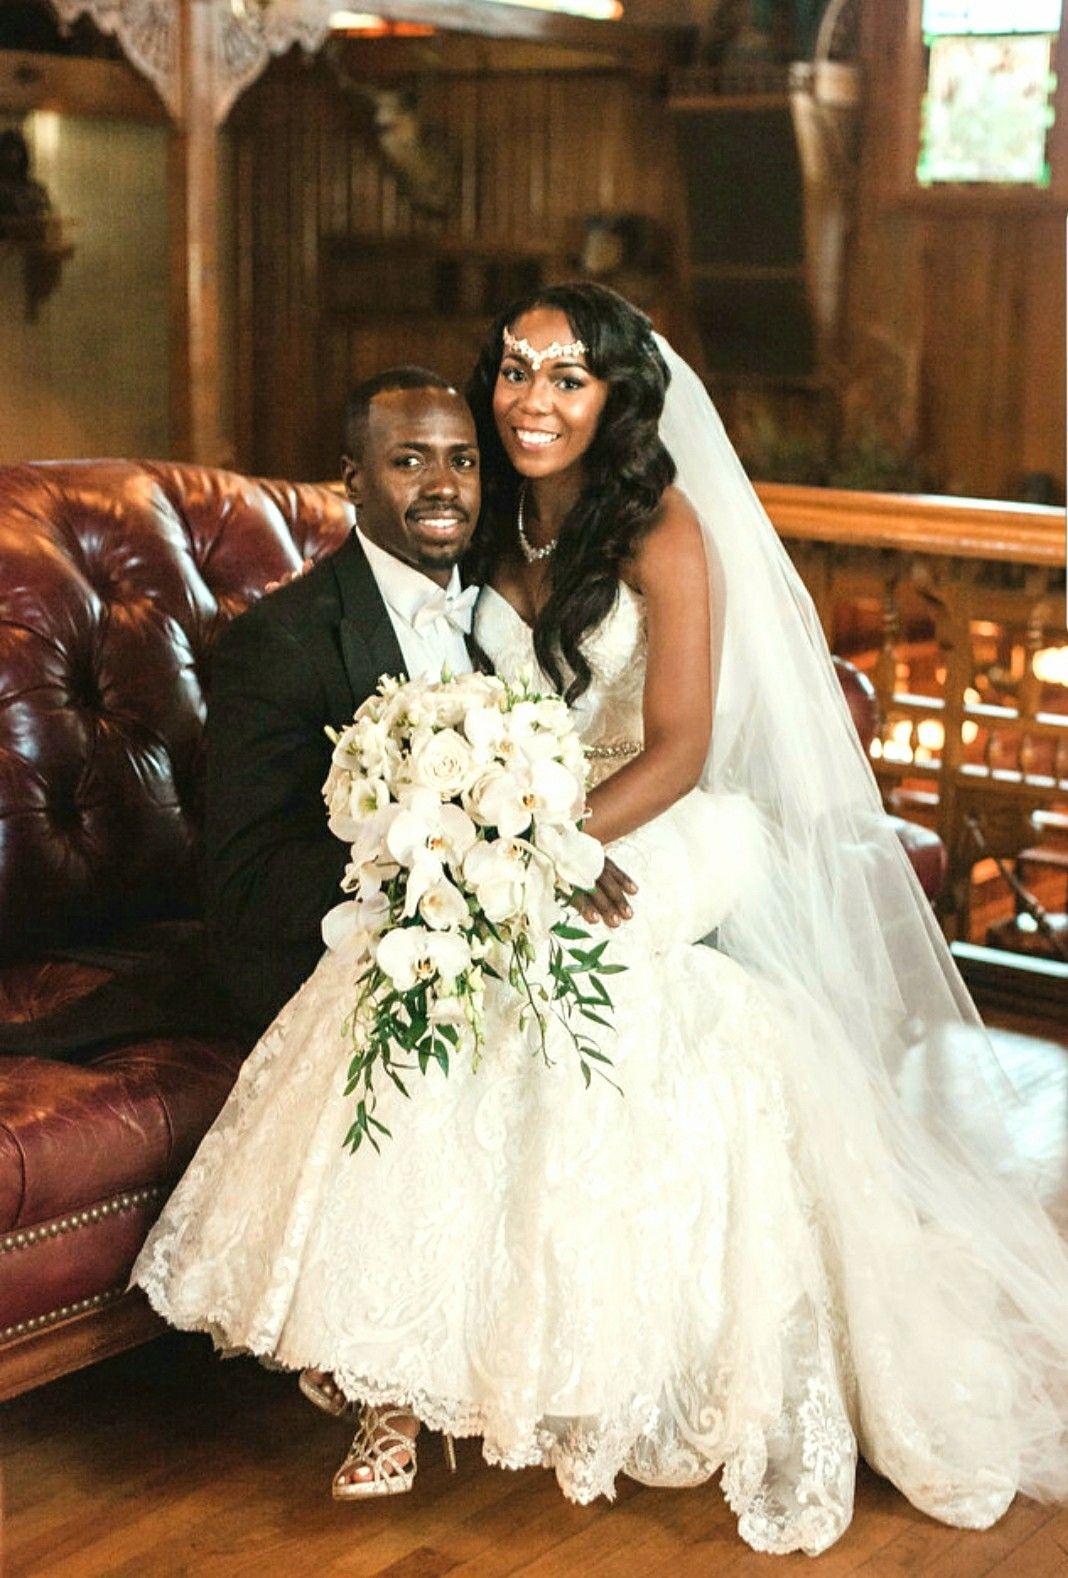 Black Brides African American Bride Groom Haitian Grooms Ivory Wedding Dress Cascade Bouquet